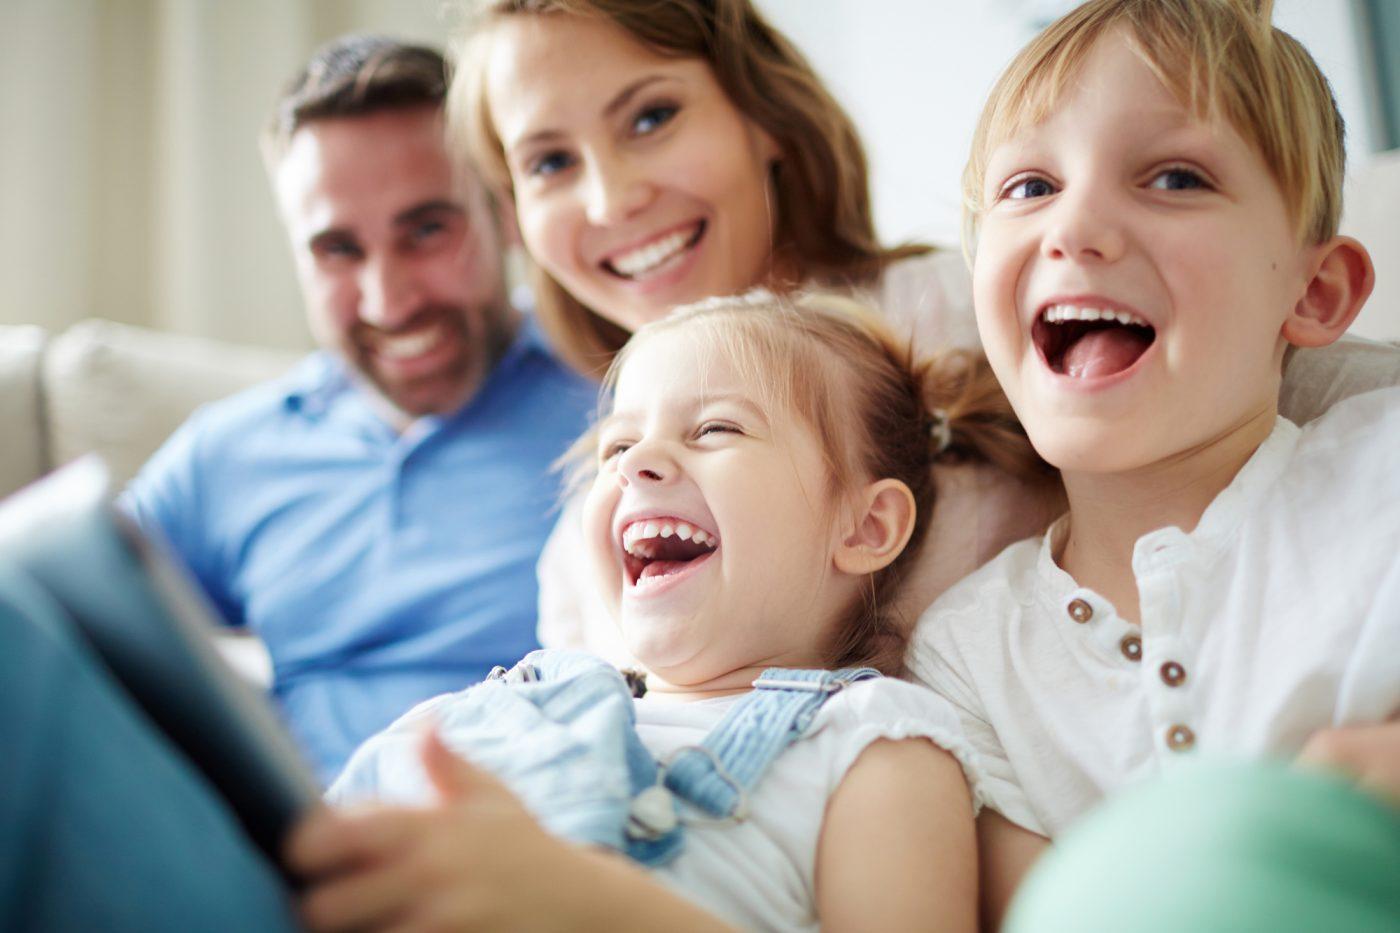 Smiles Family Visit